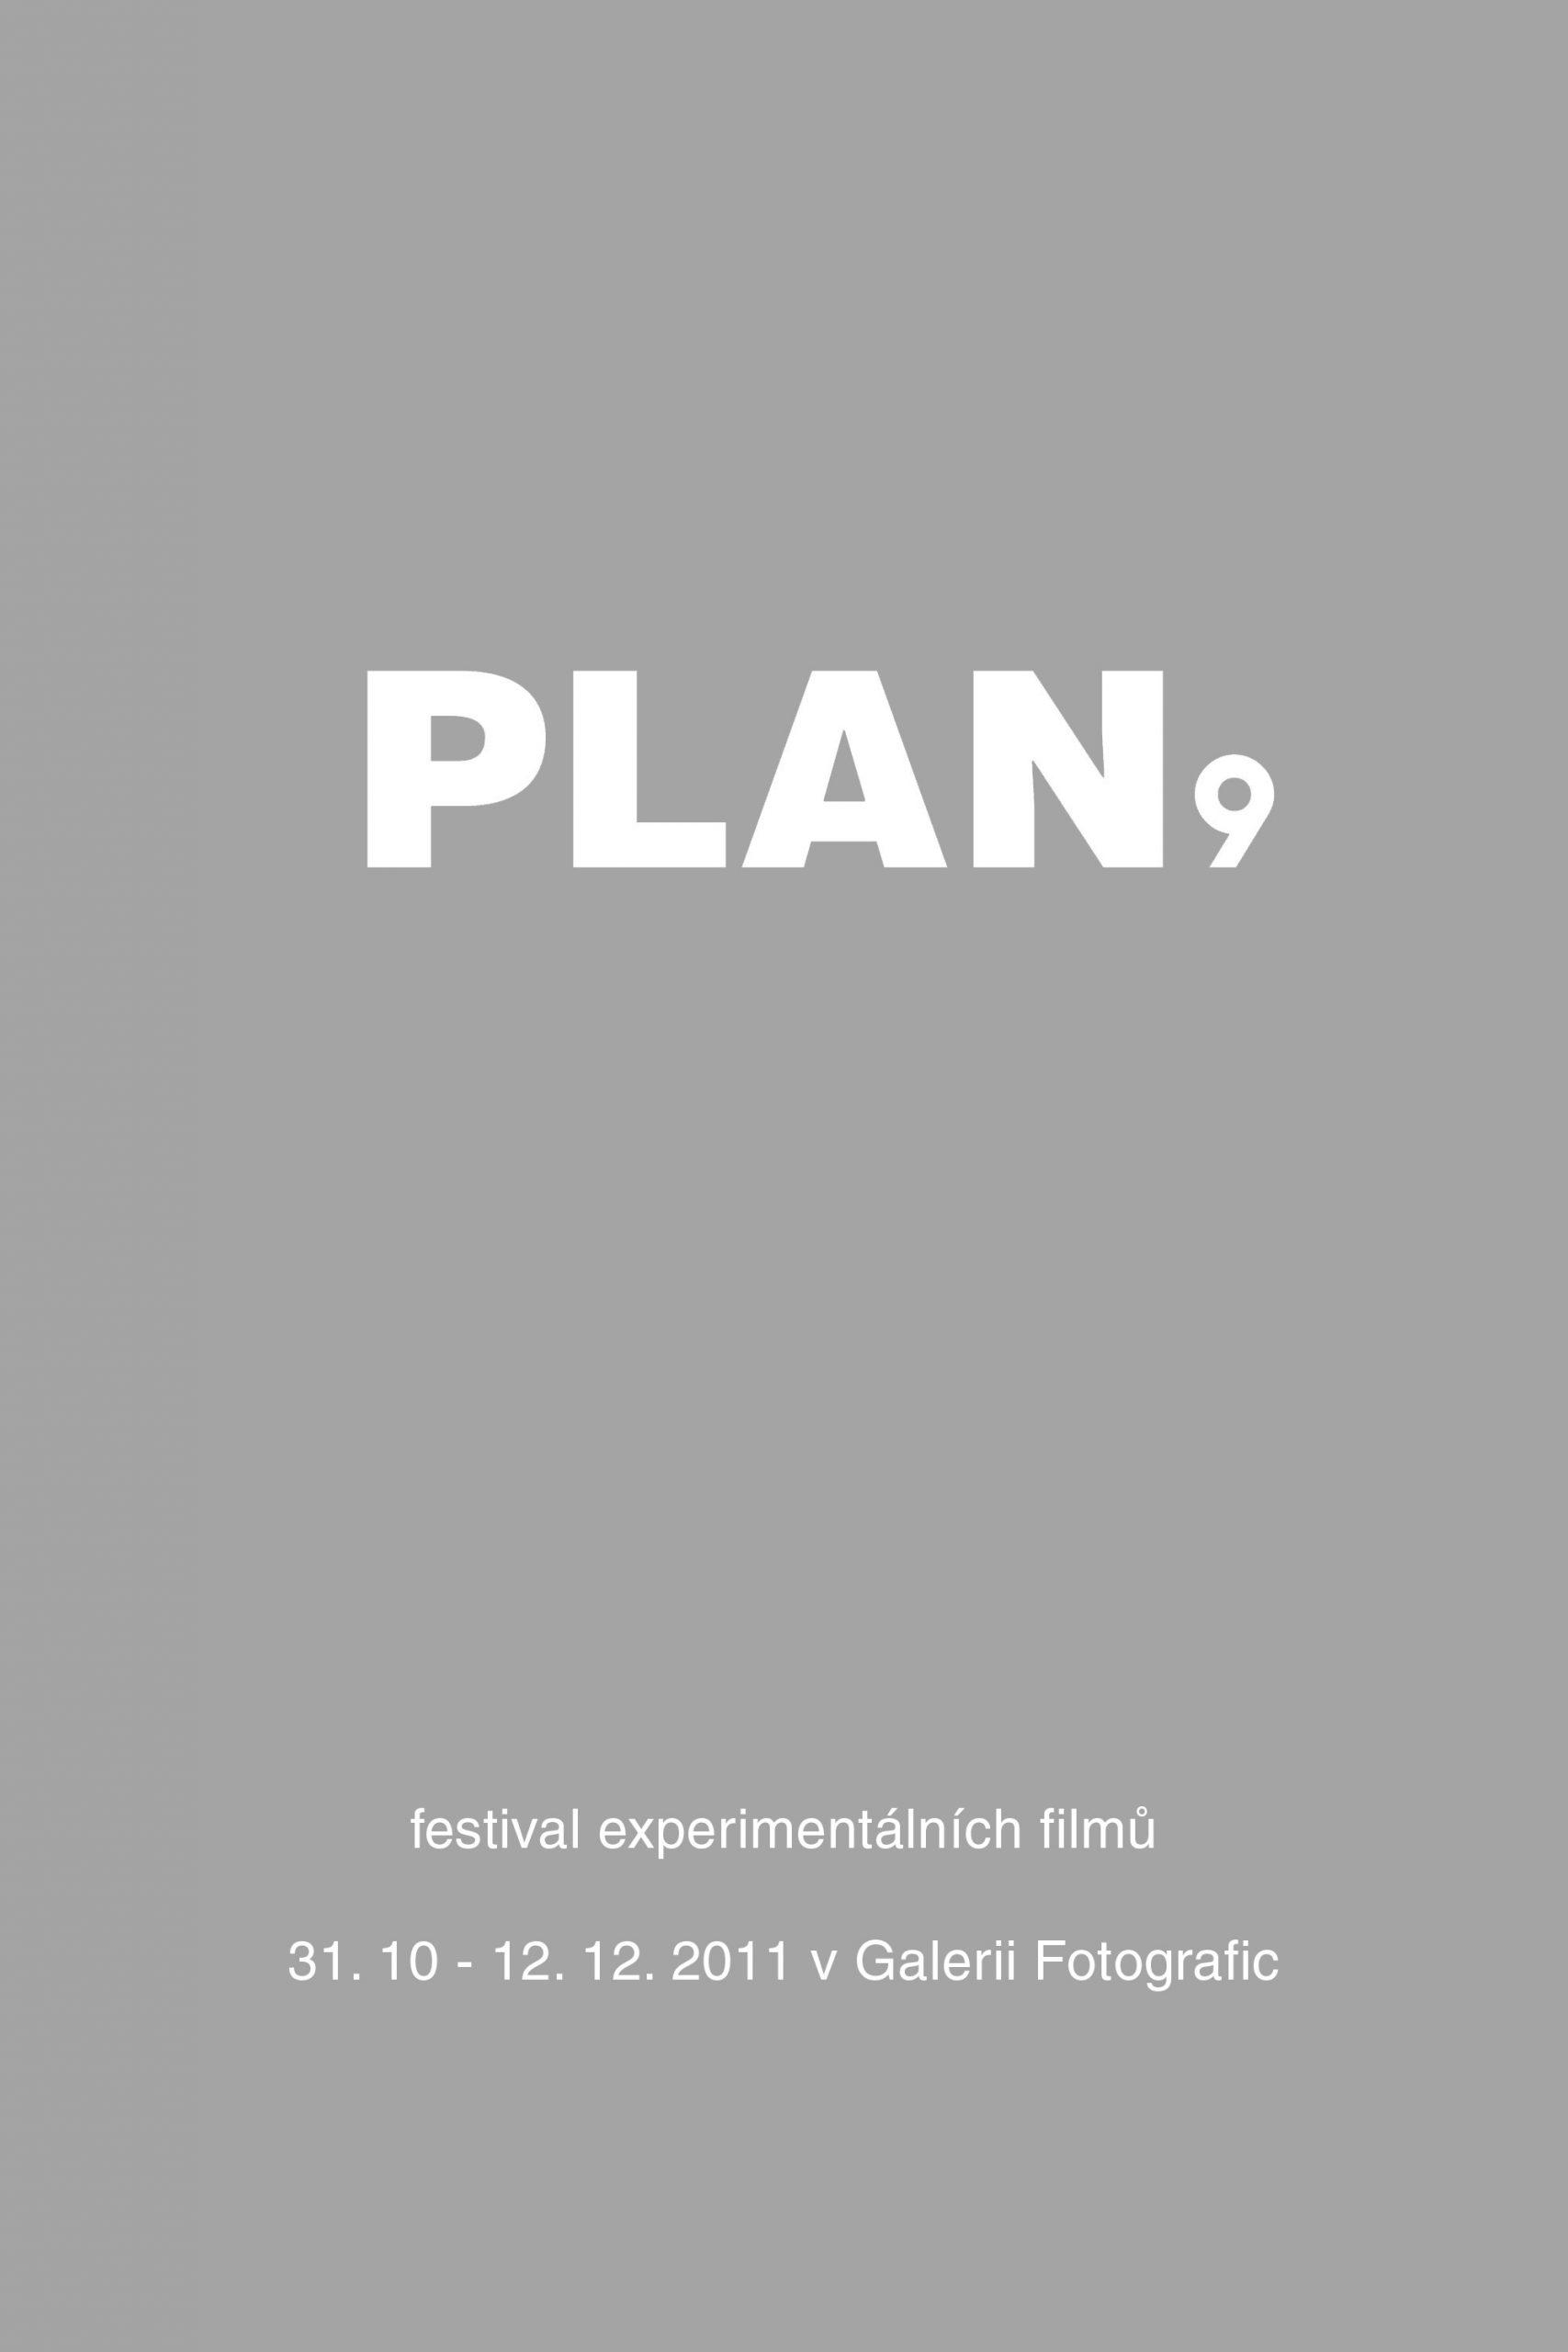 PLAN 9 2011 film festival at Fotografic - poster